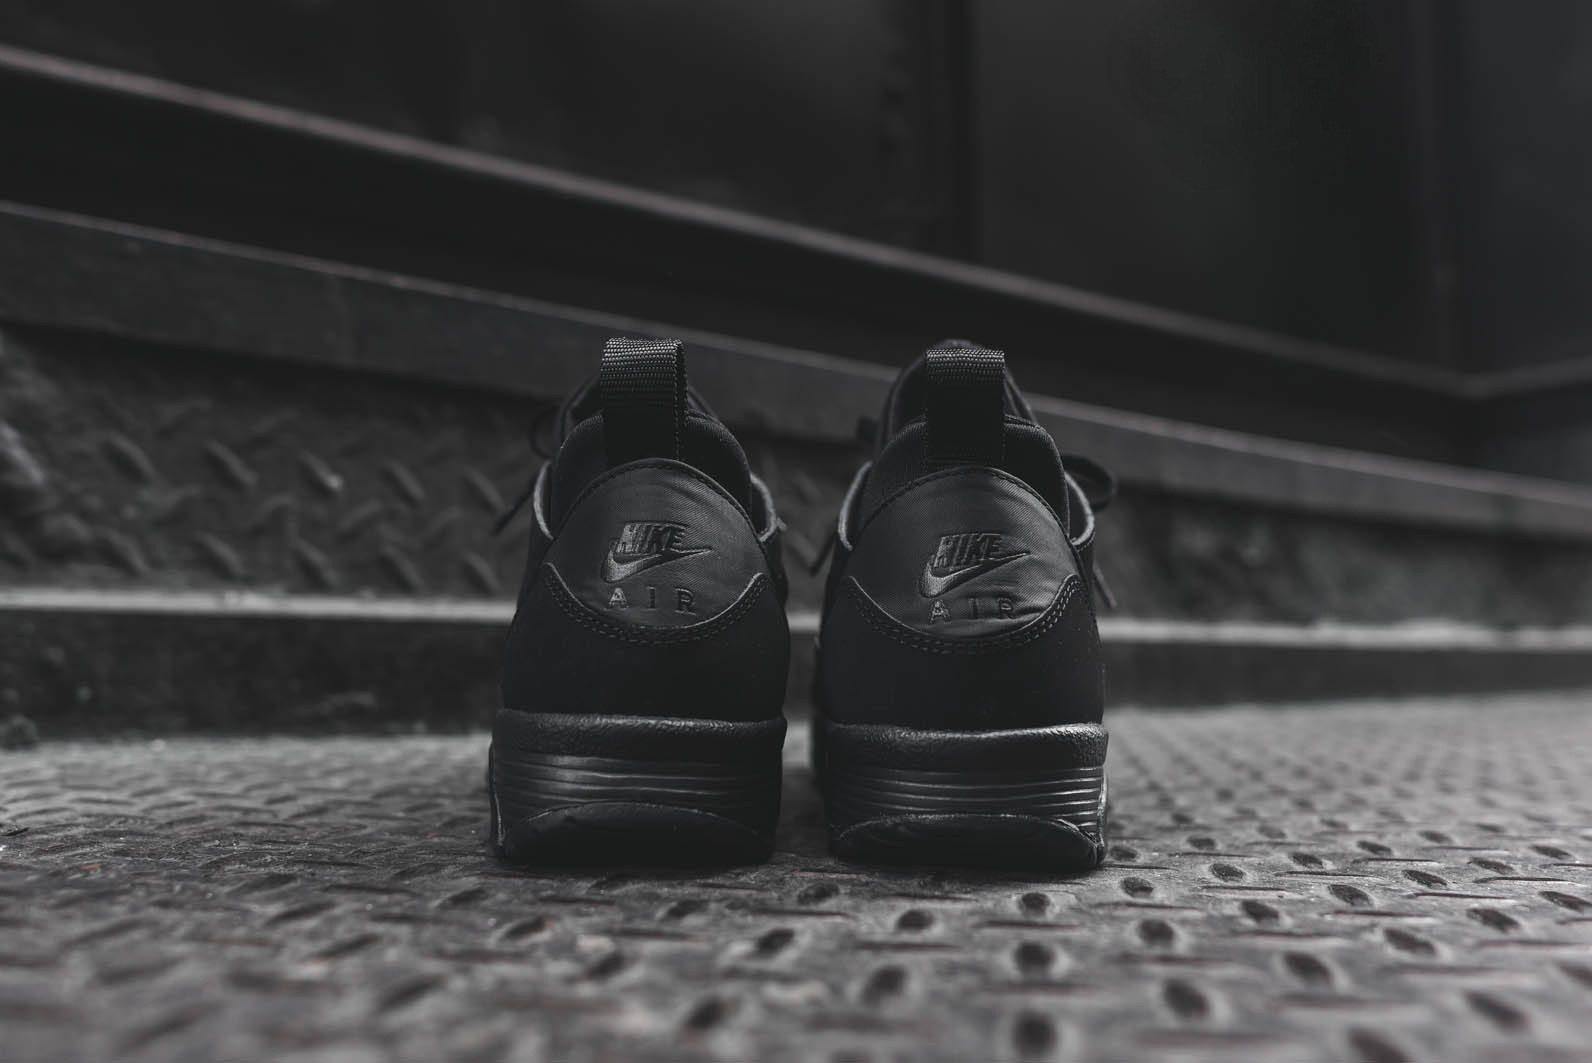 Nike Air Trainer Huarache Low Triple Black 5